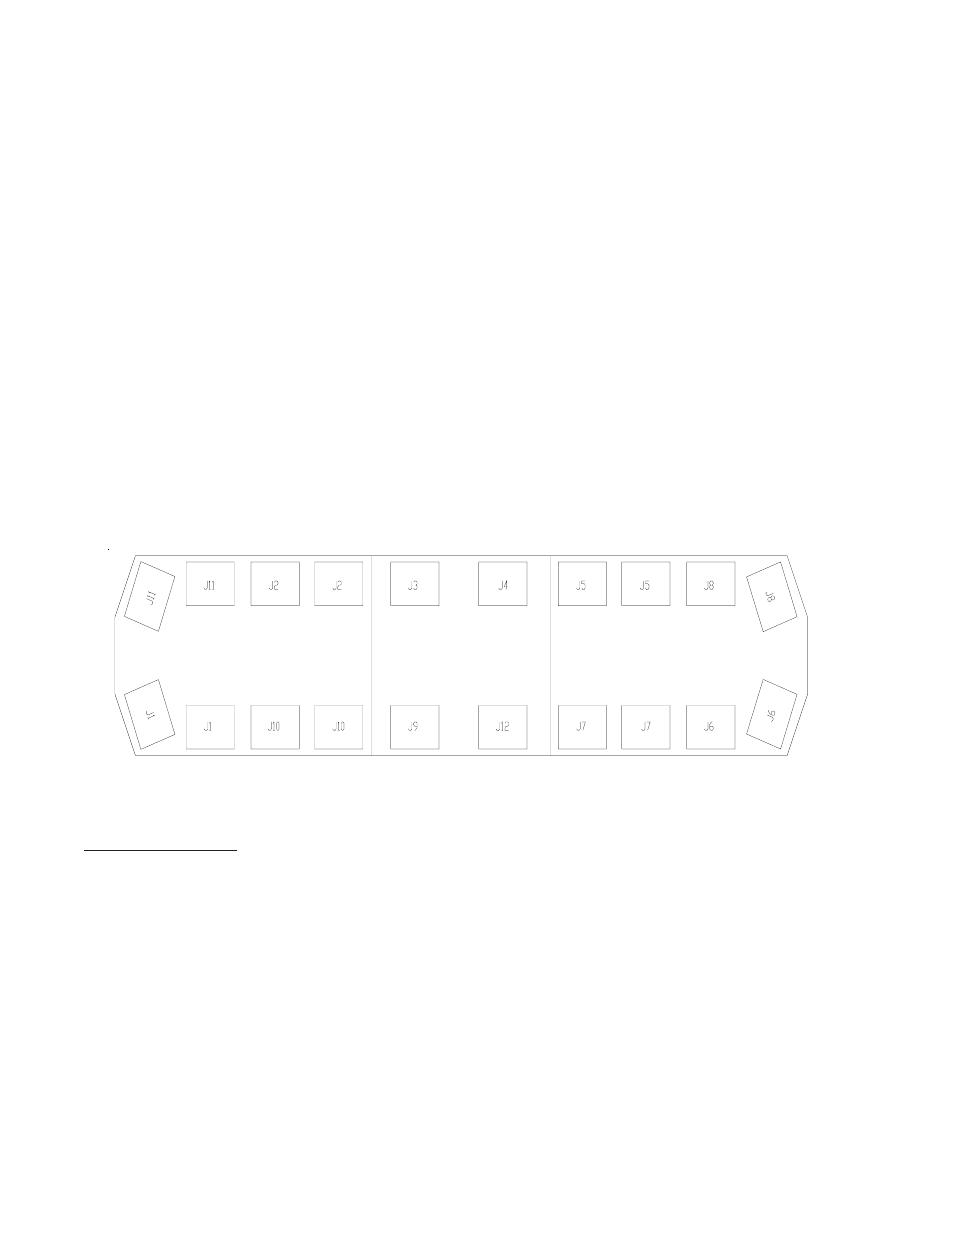 code 3 2100 wiring diagram code 3 2100 parts, code 3 lp6000 wiring